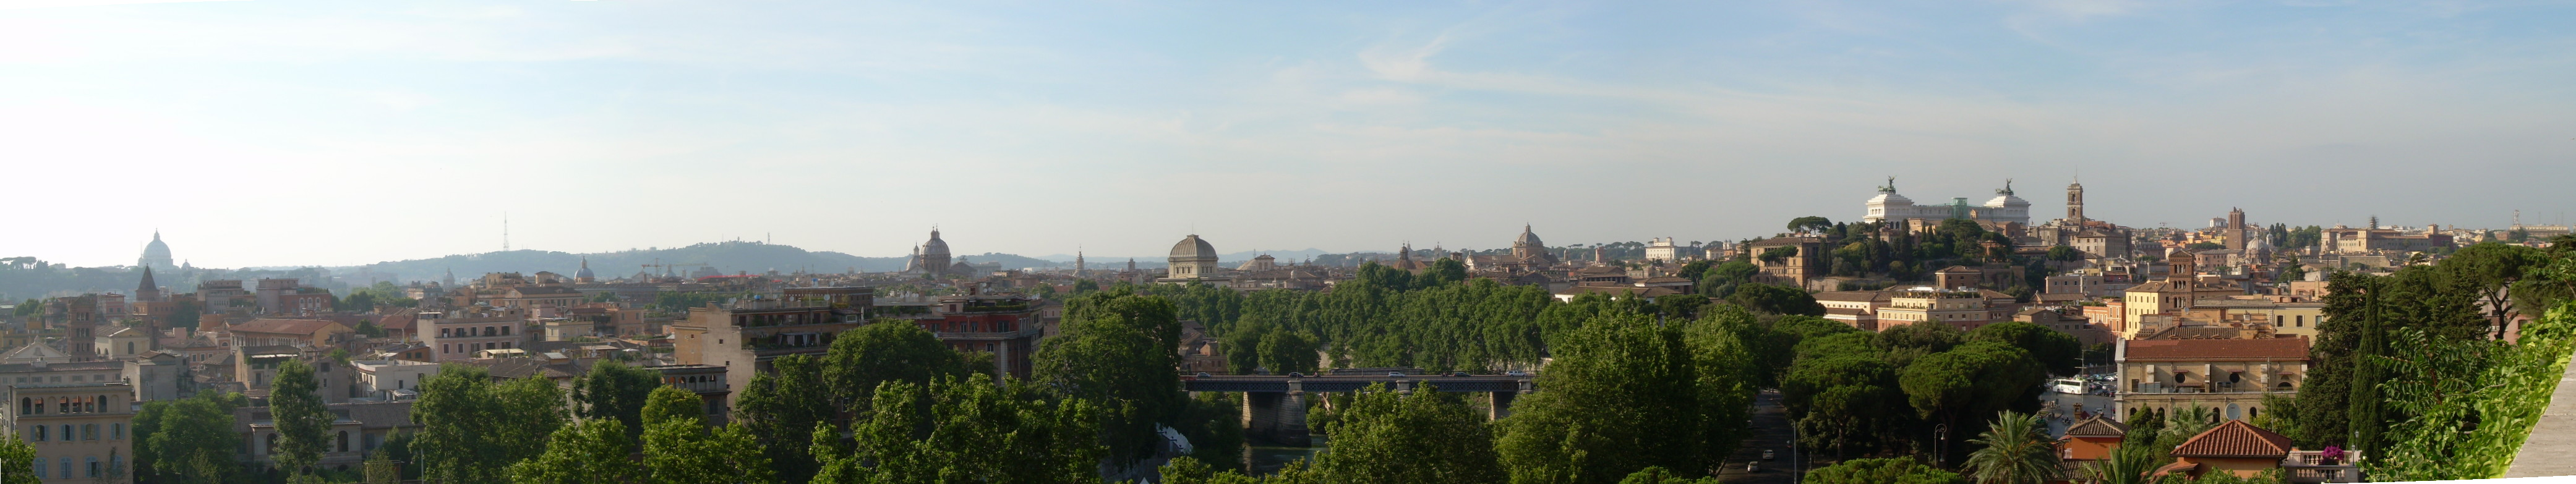 Roma_Giardino_degli_Aranci_veduta